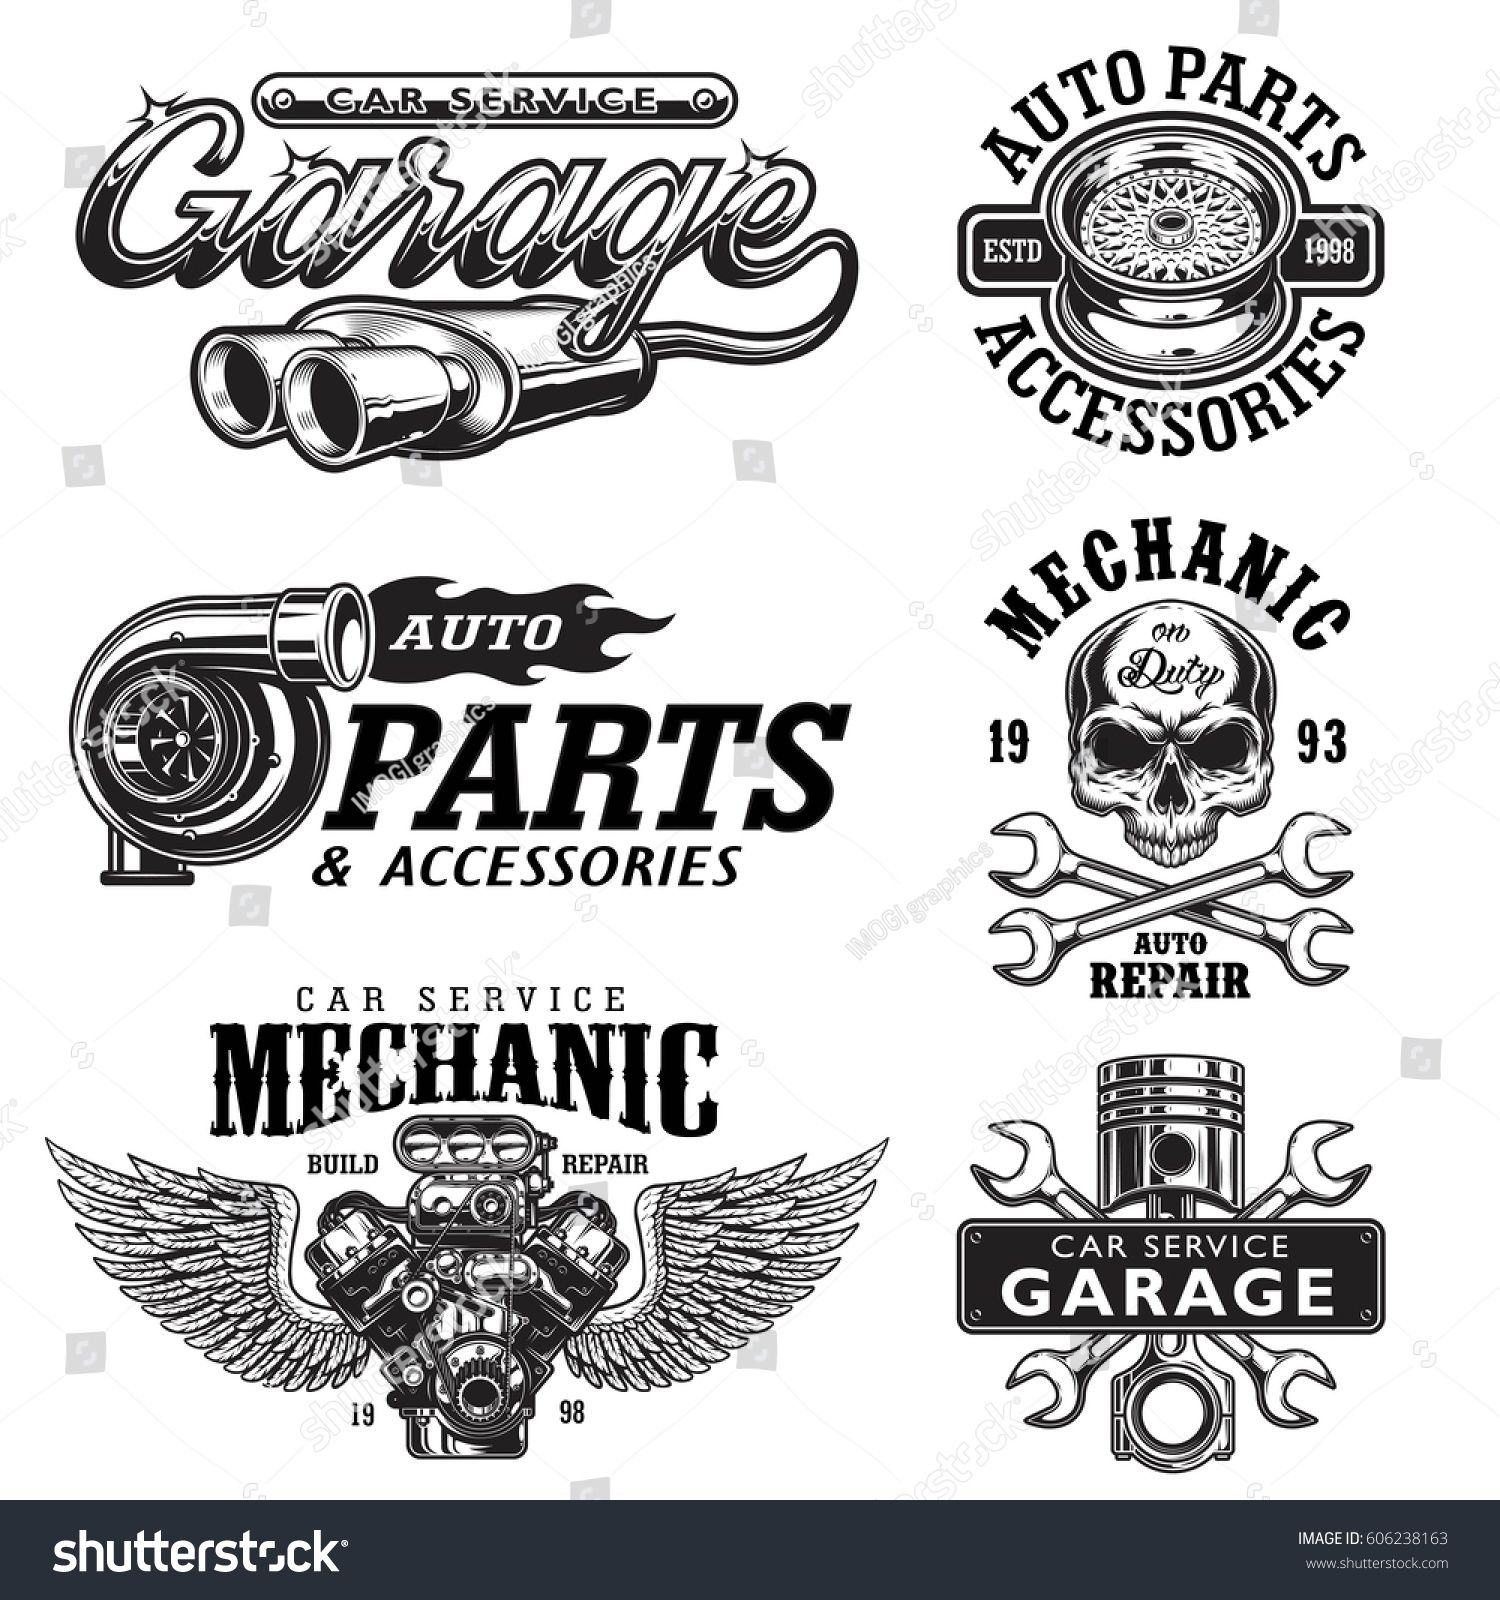 Set of vintage monochrome auto repair service templates of